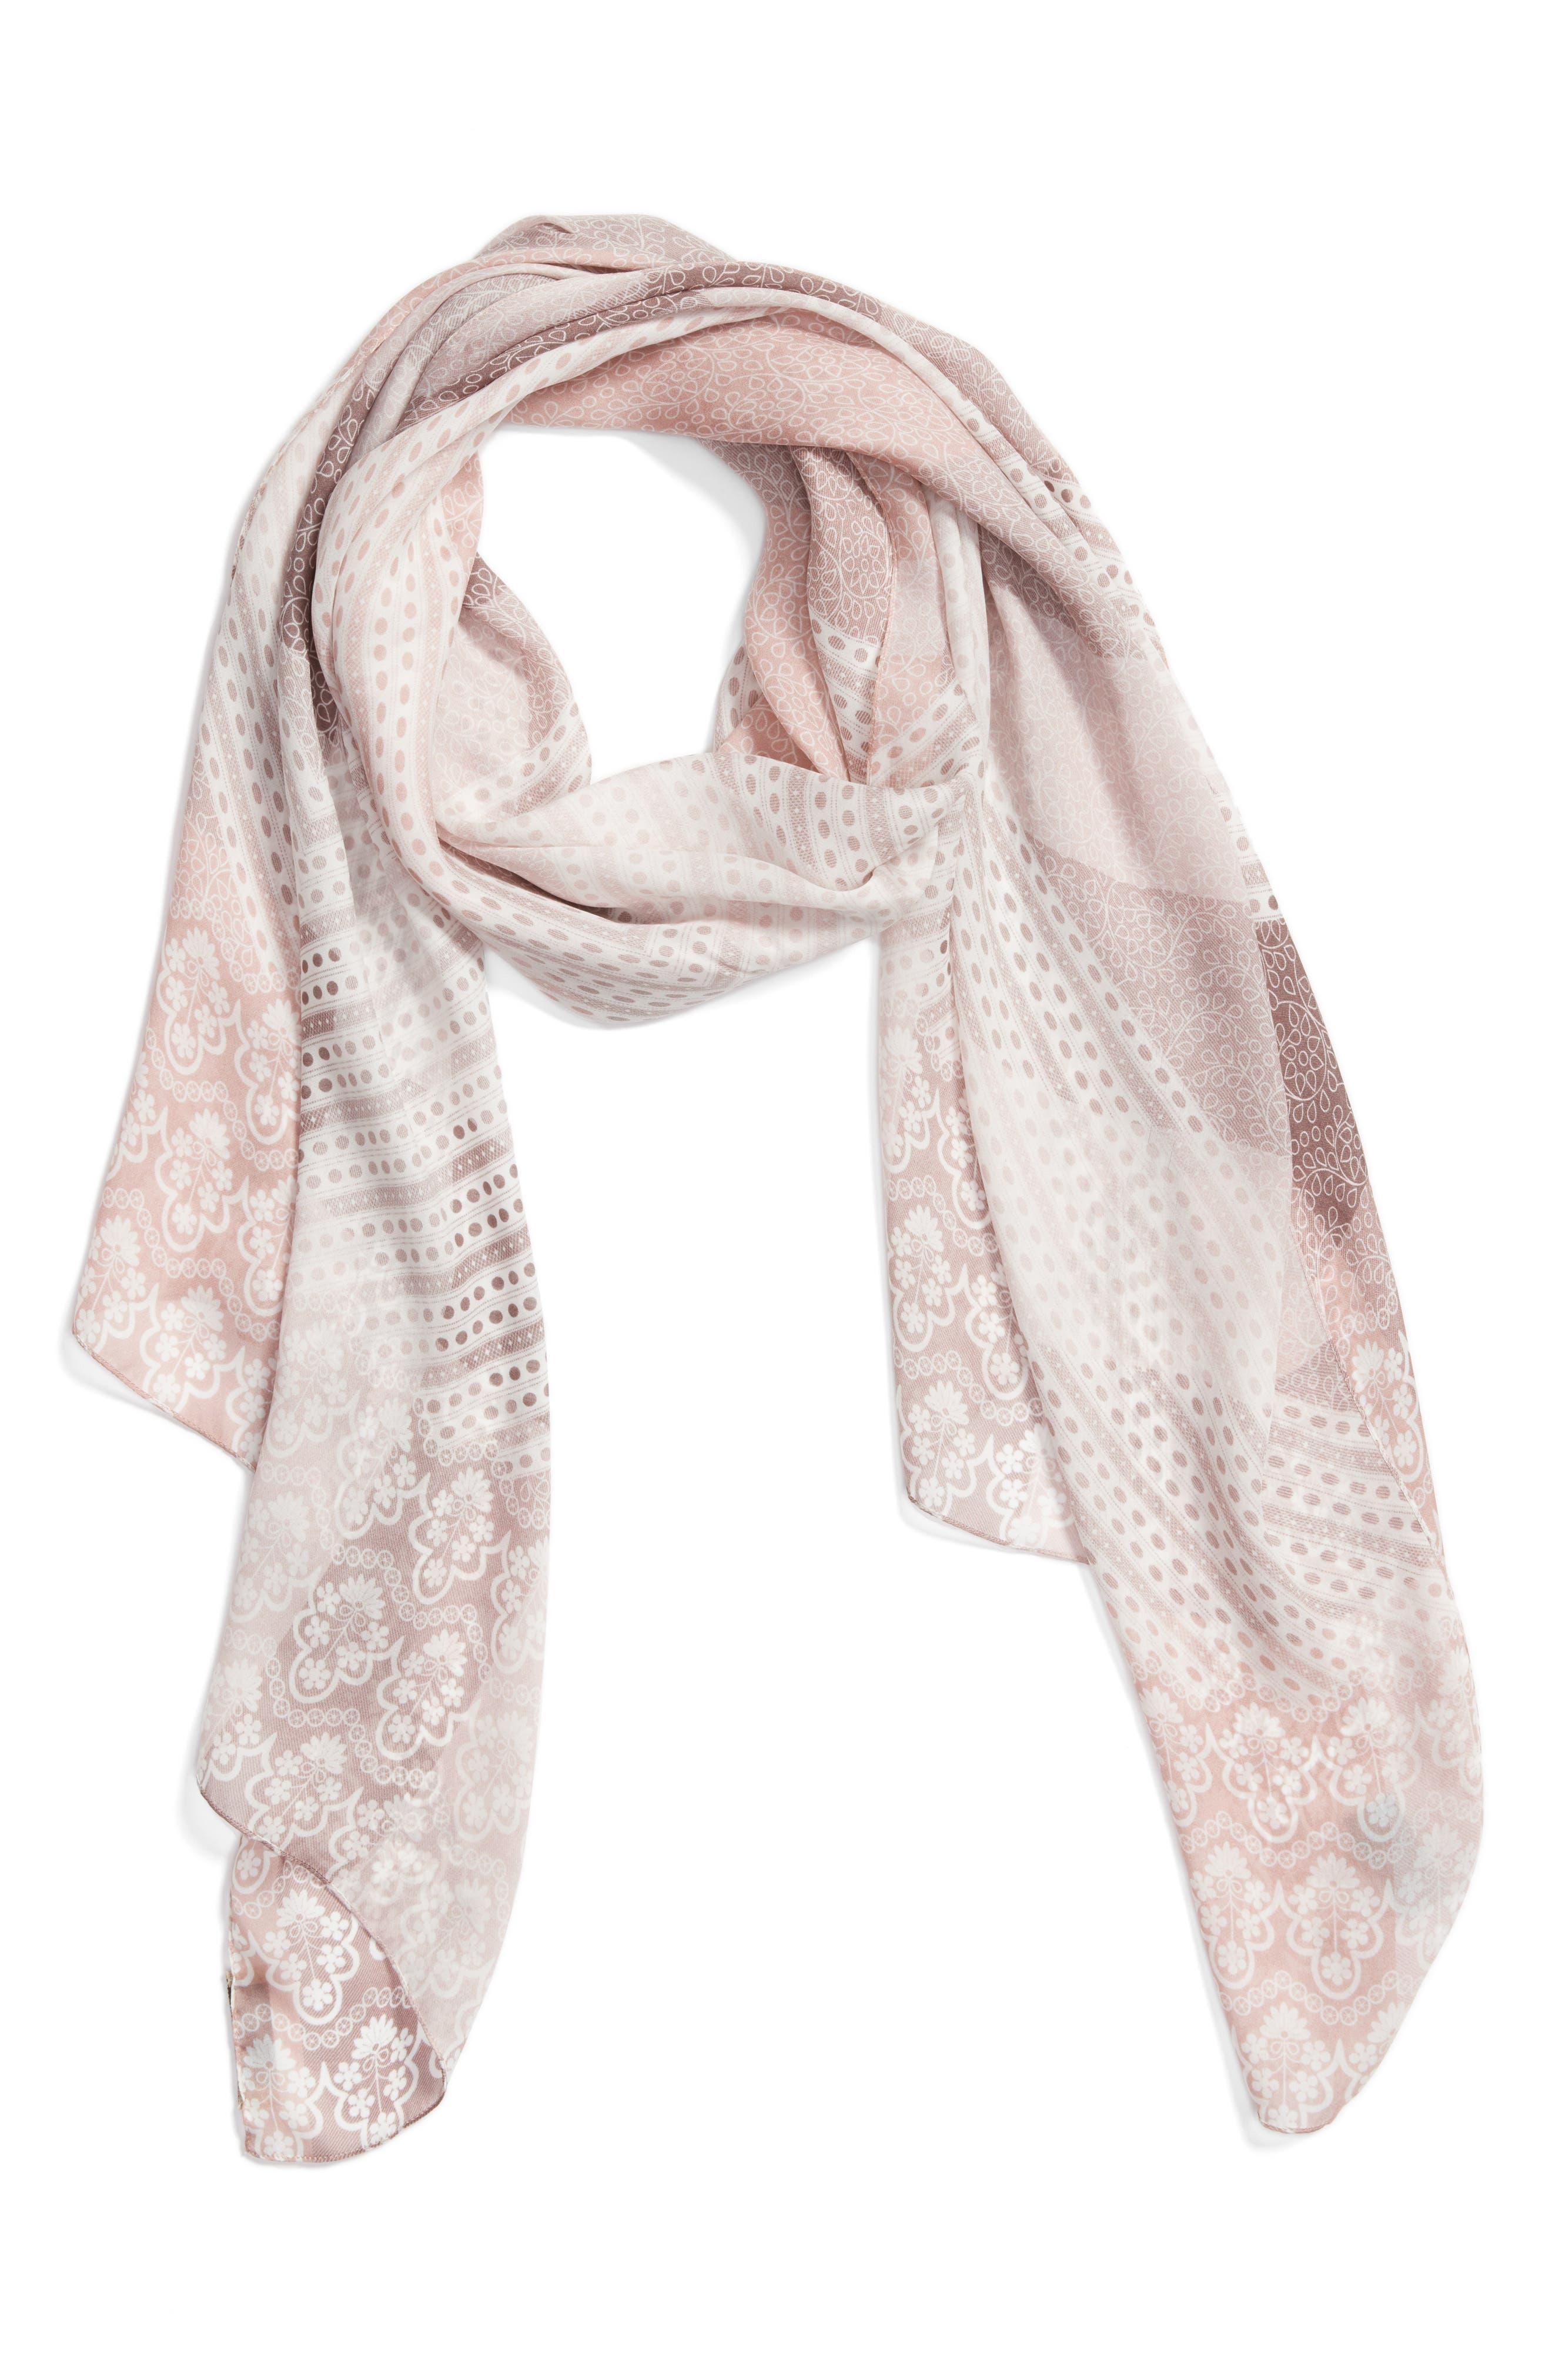 Ultra Mega Lace Silk Scarf,                             Main thumbnail 1, color,                             Ash Rose Pink